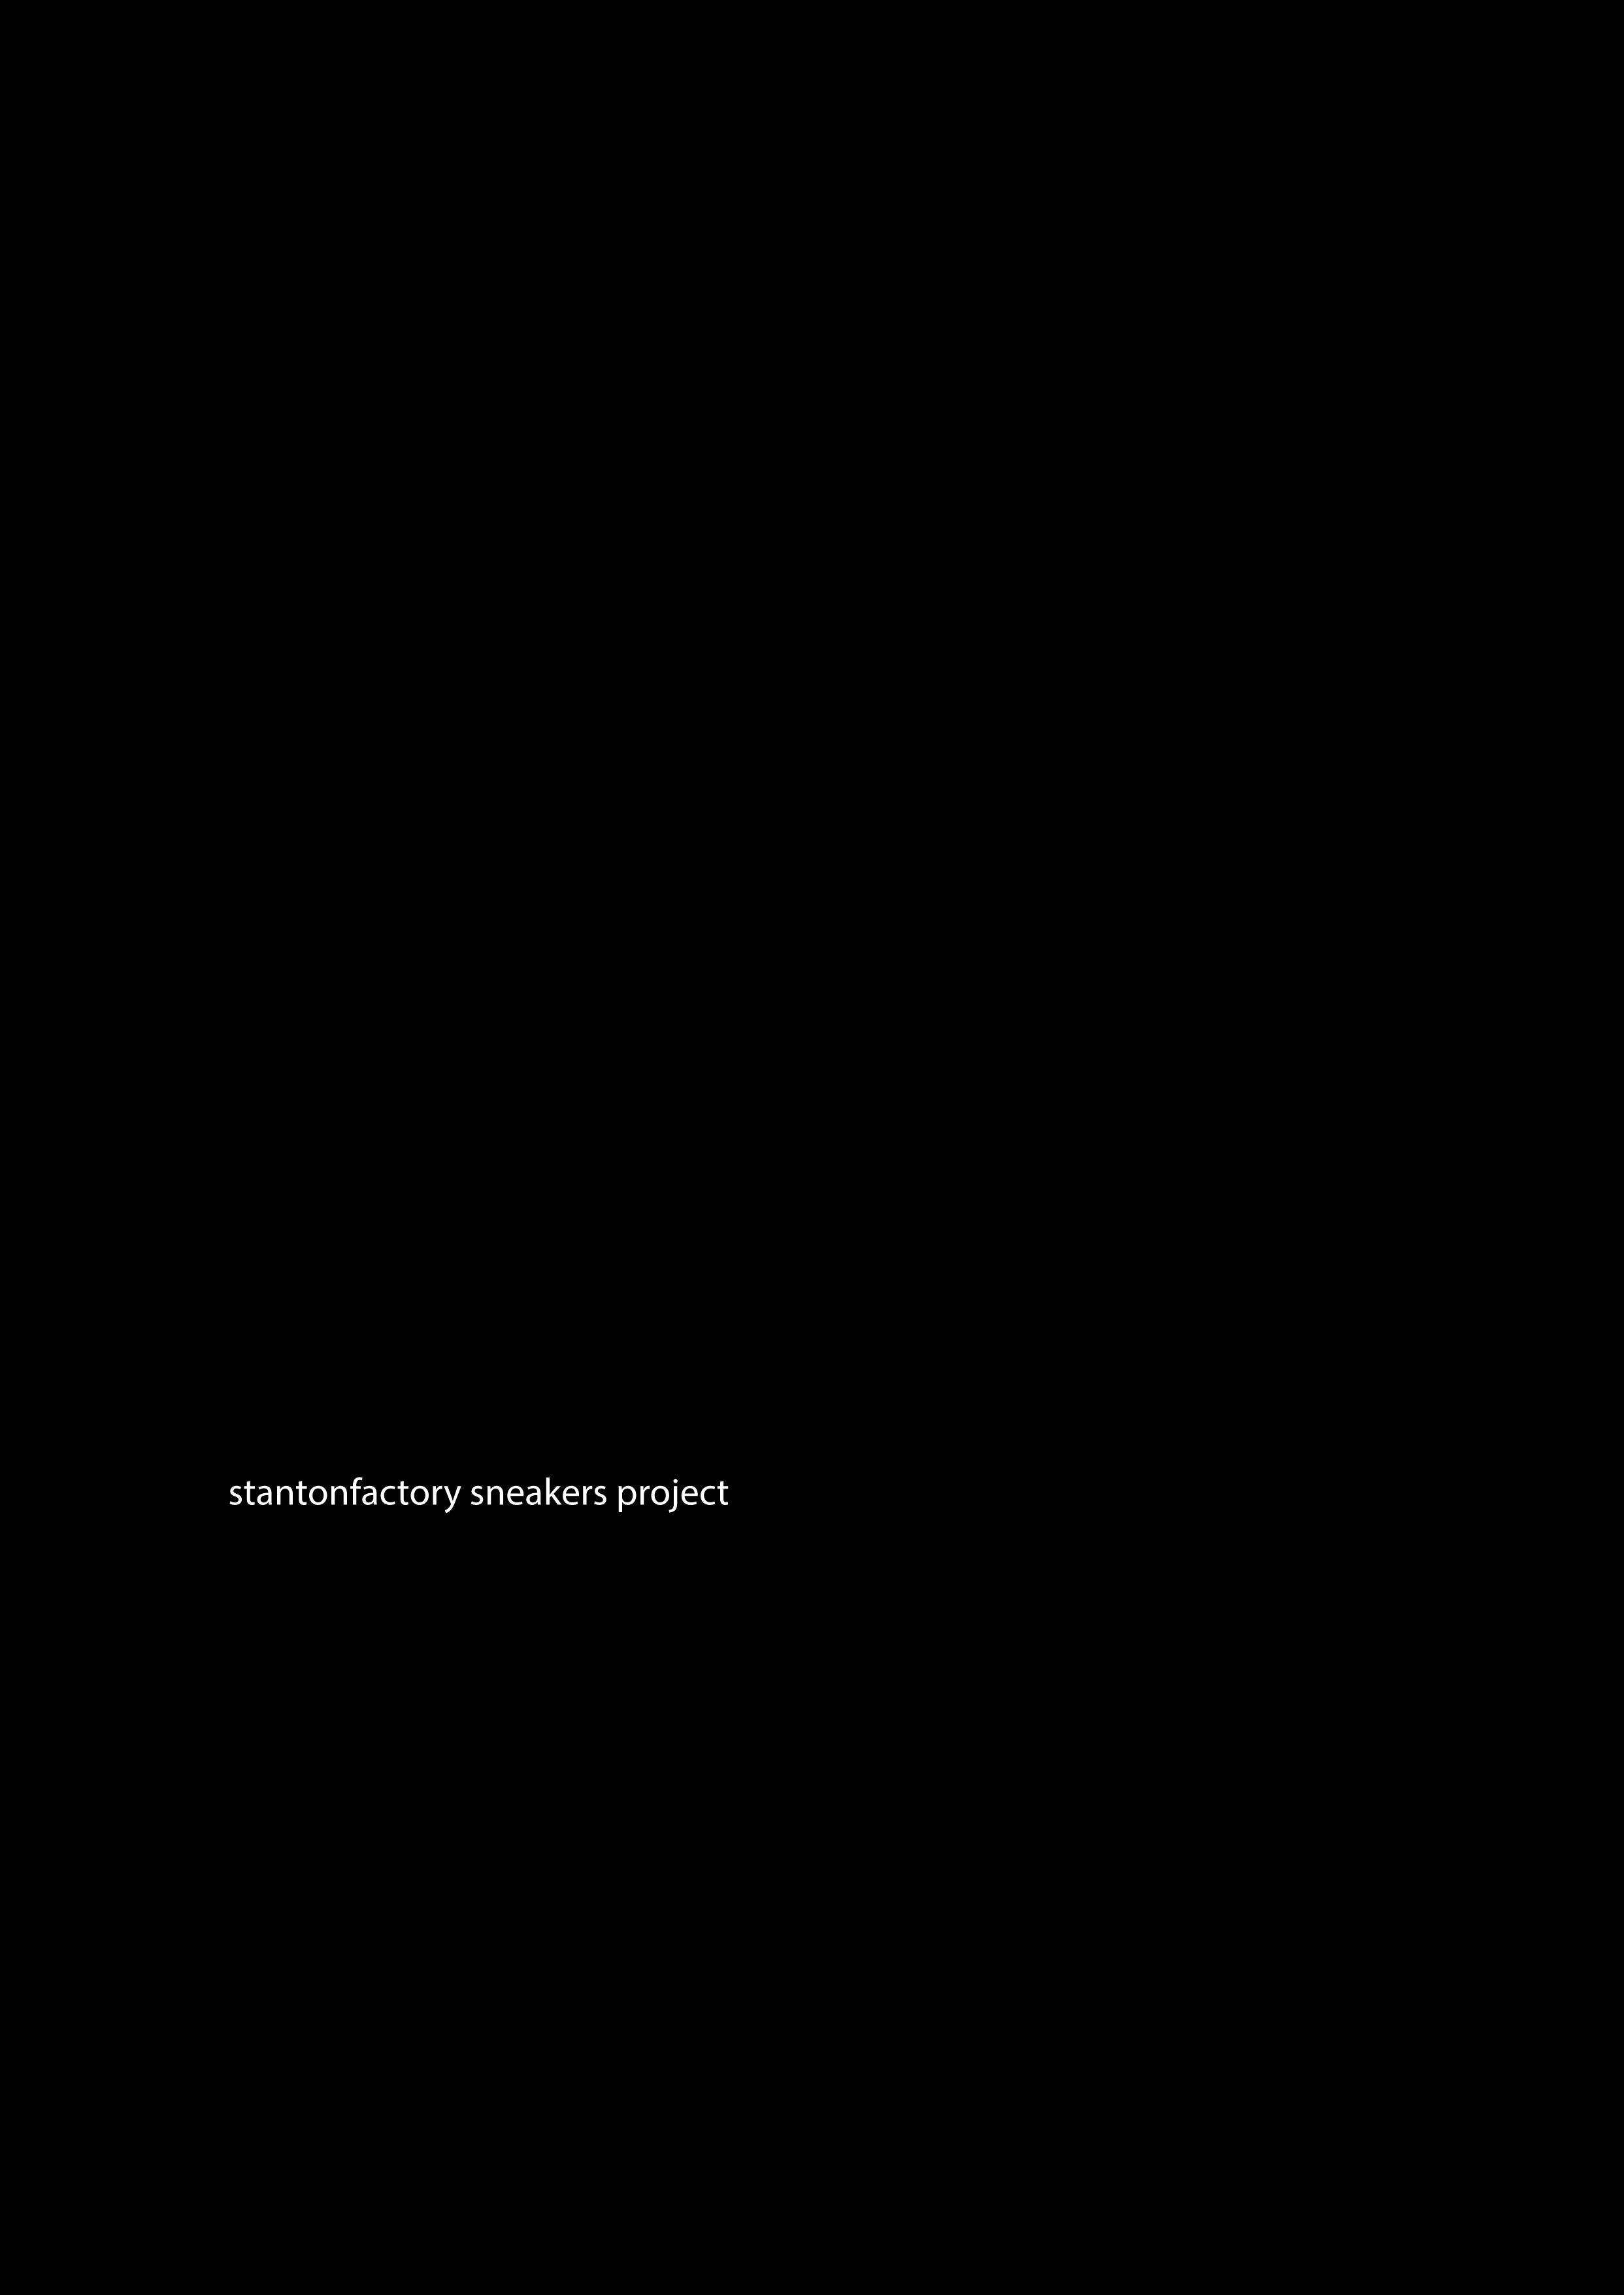 Stantonfactory - Andrea Fecchio - Portfolio Cover 2